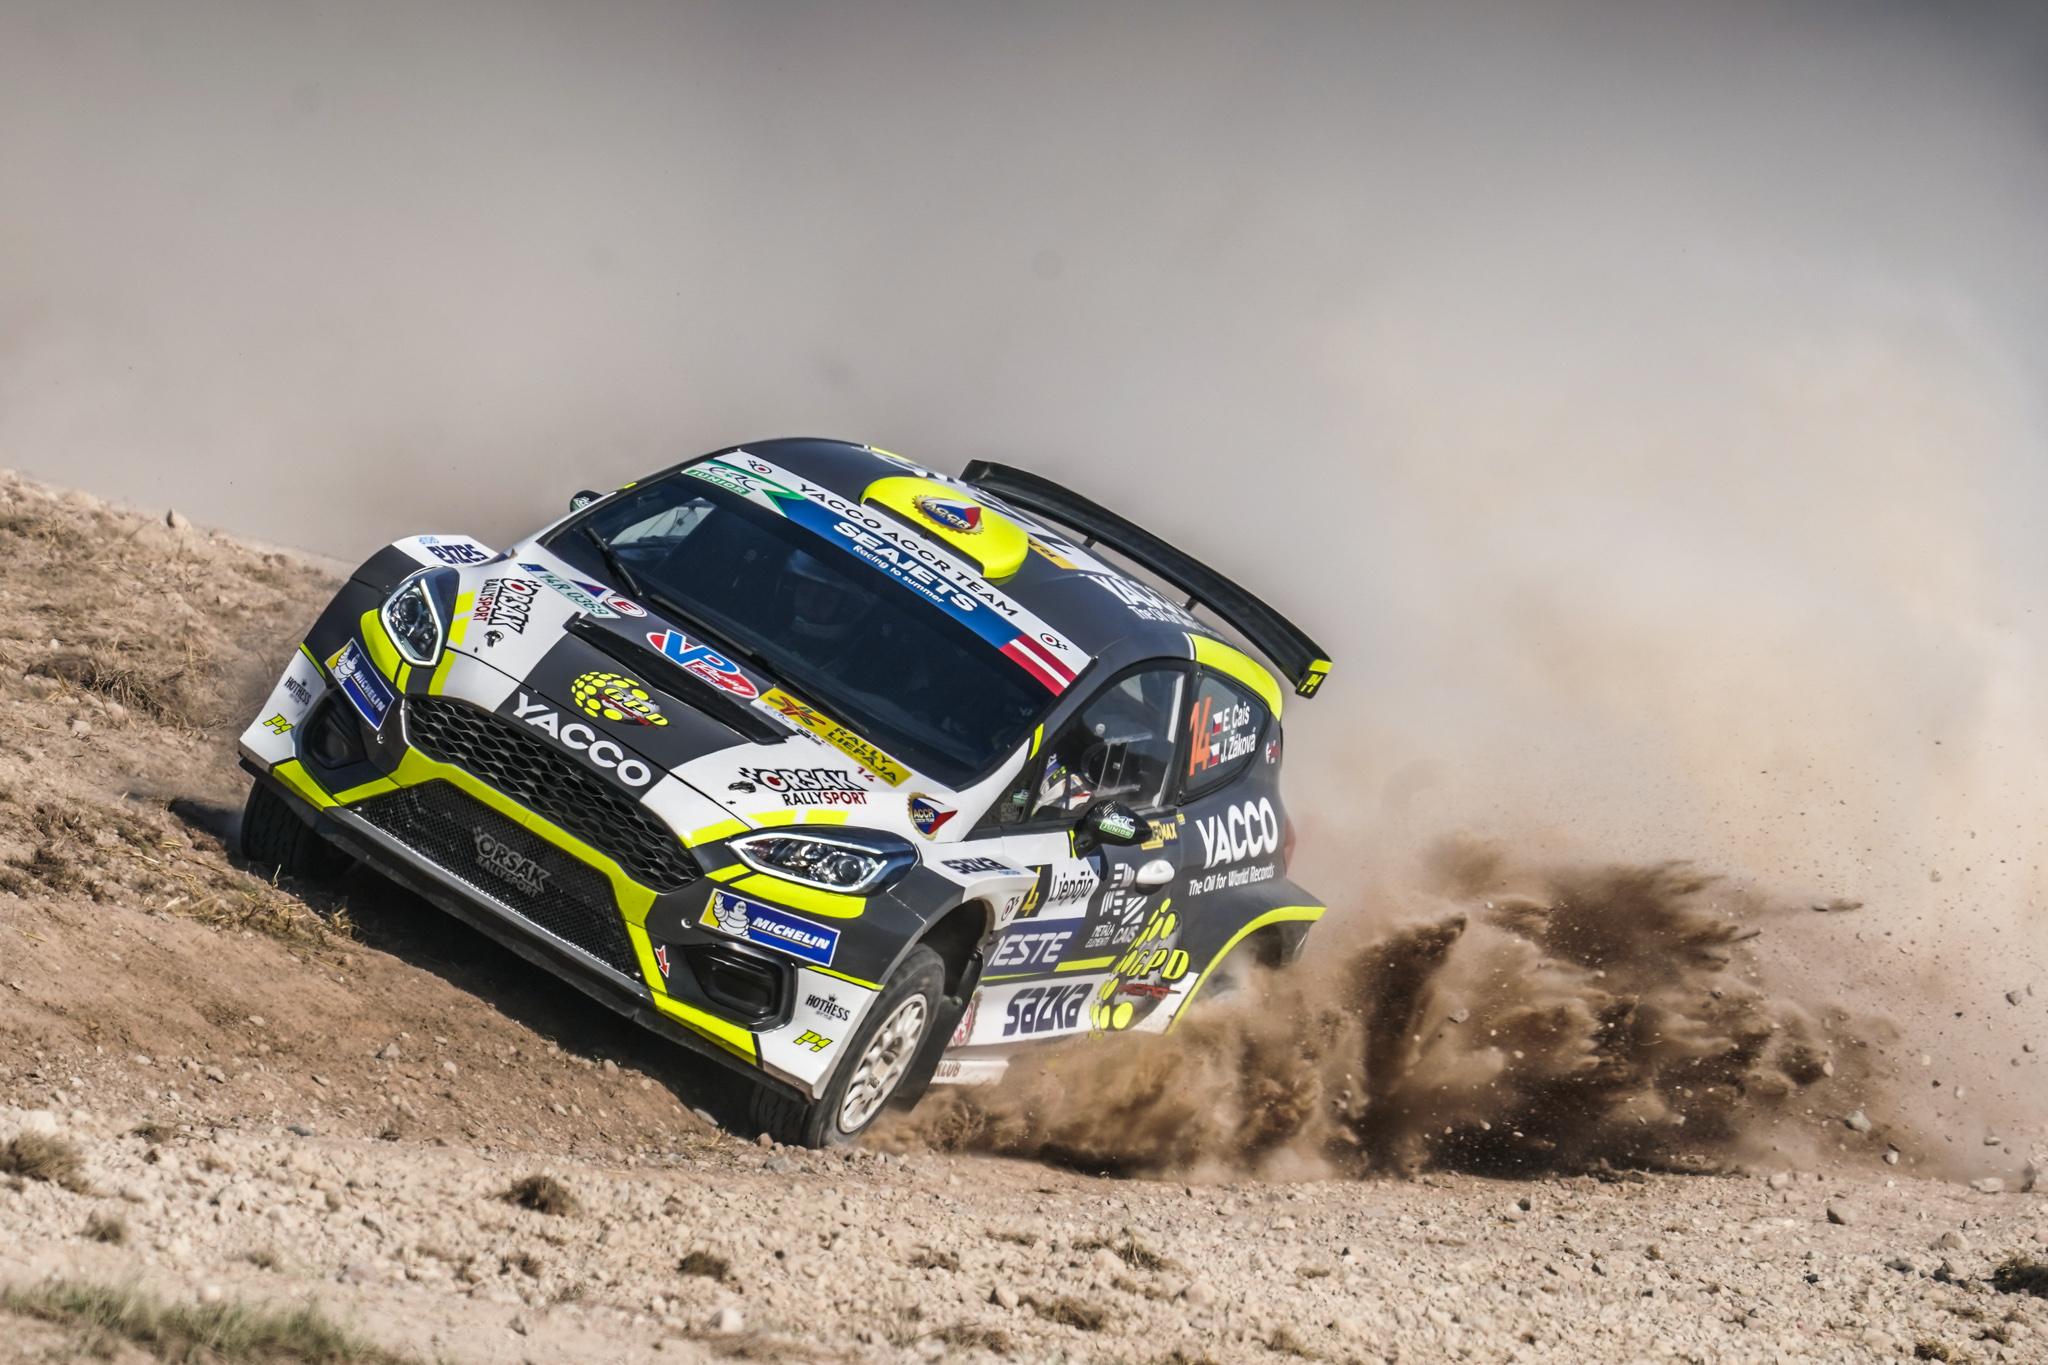 Rally Liepāja 2020 - Erik Cais